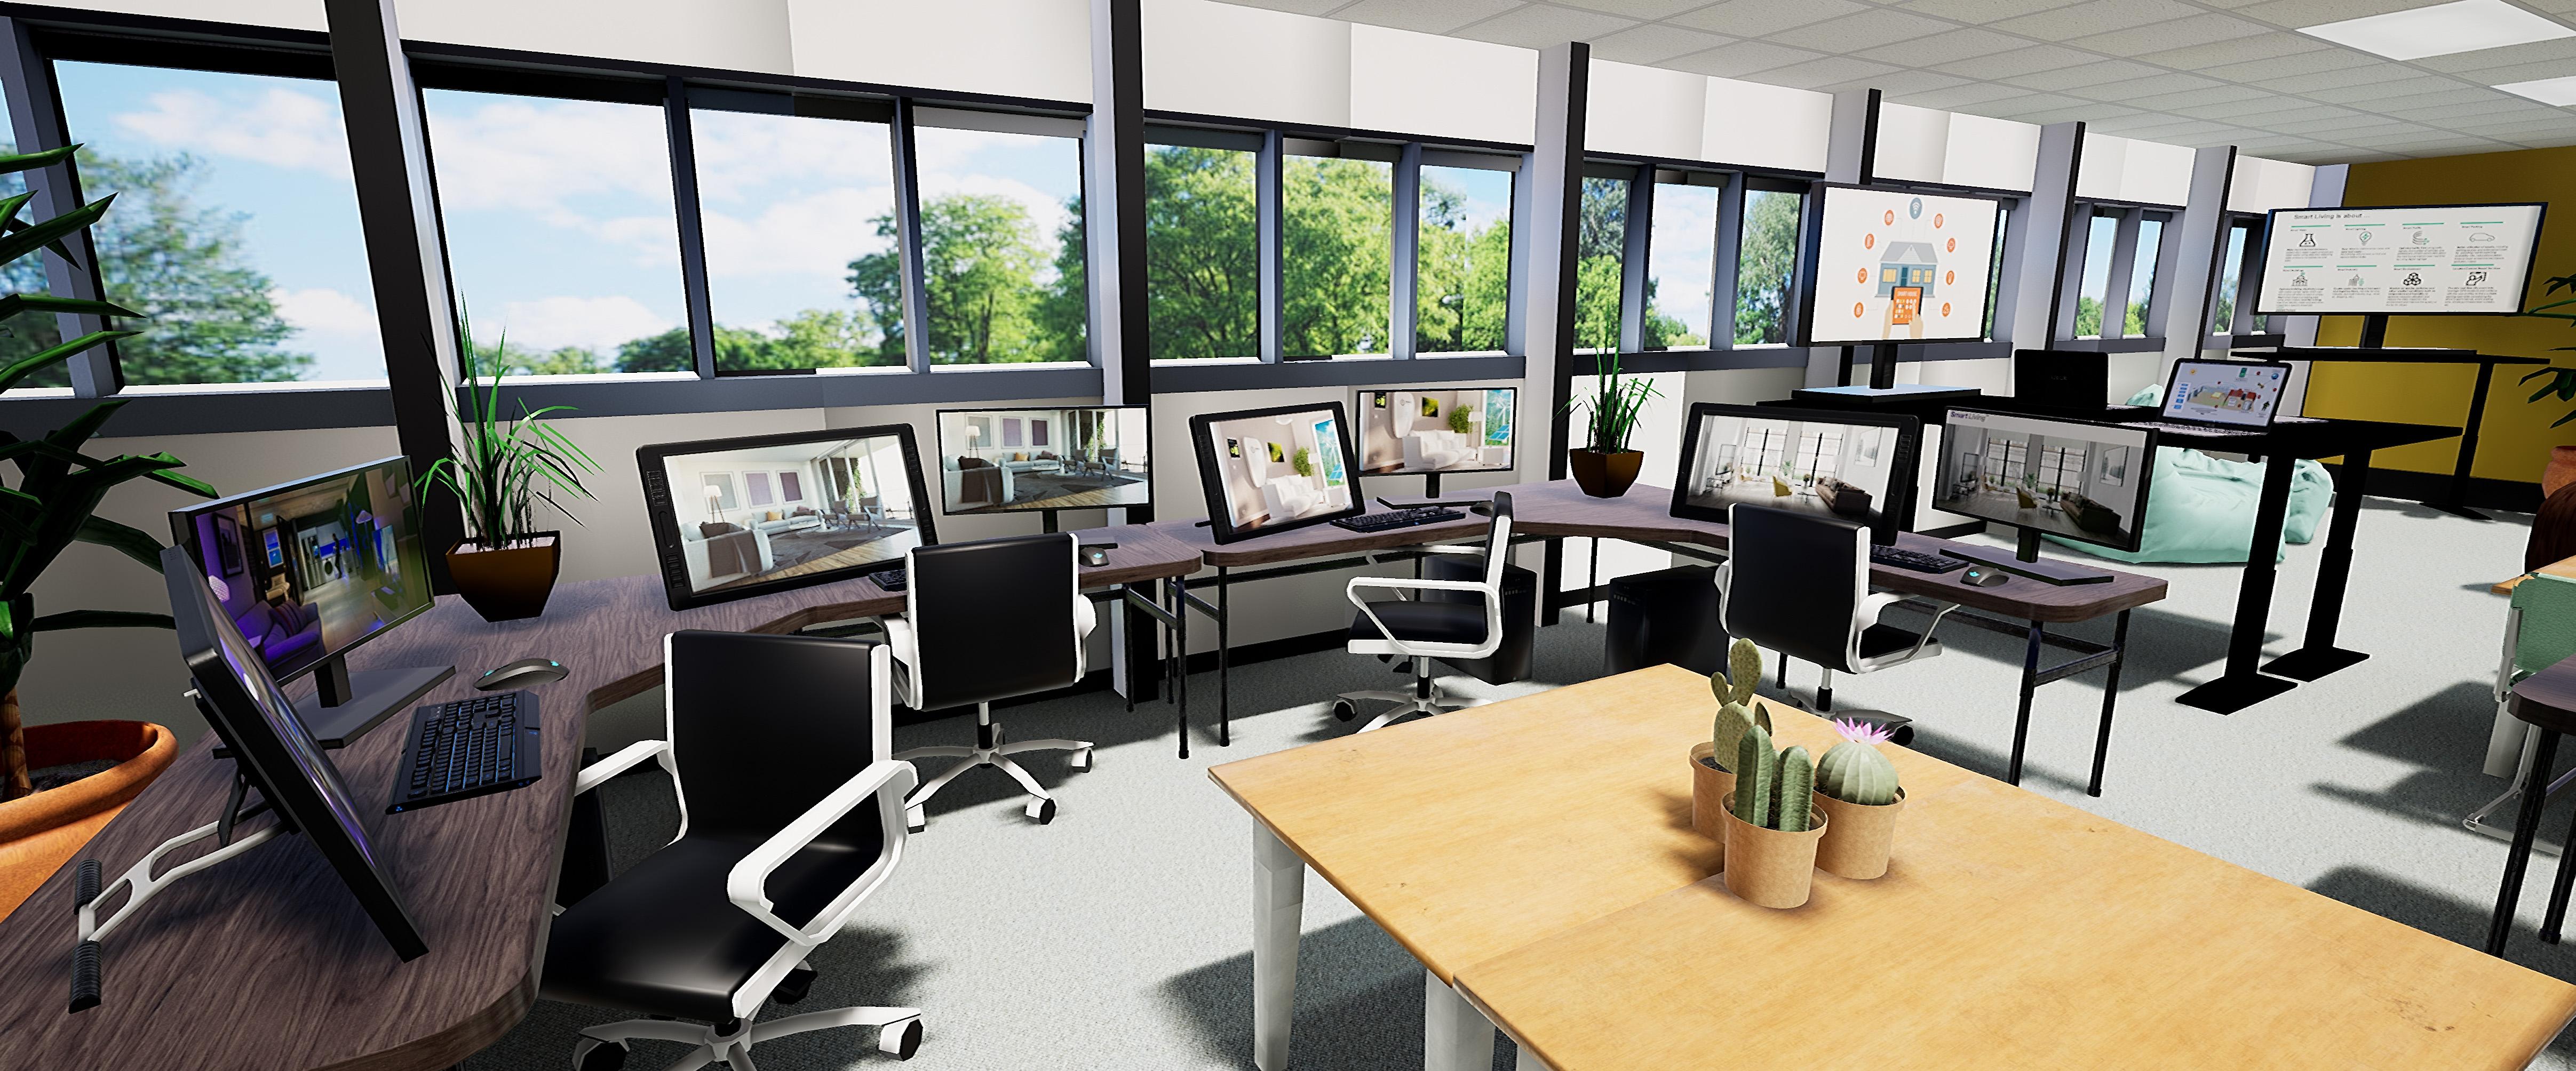 Adastral-Park Oberon-Office (13)